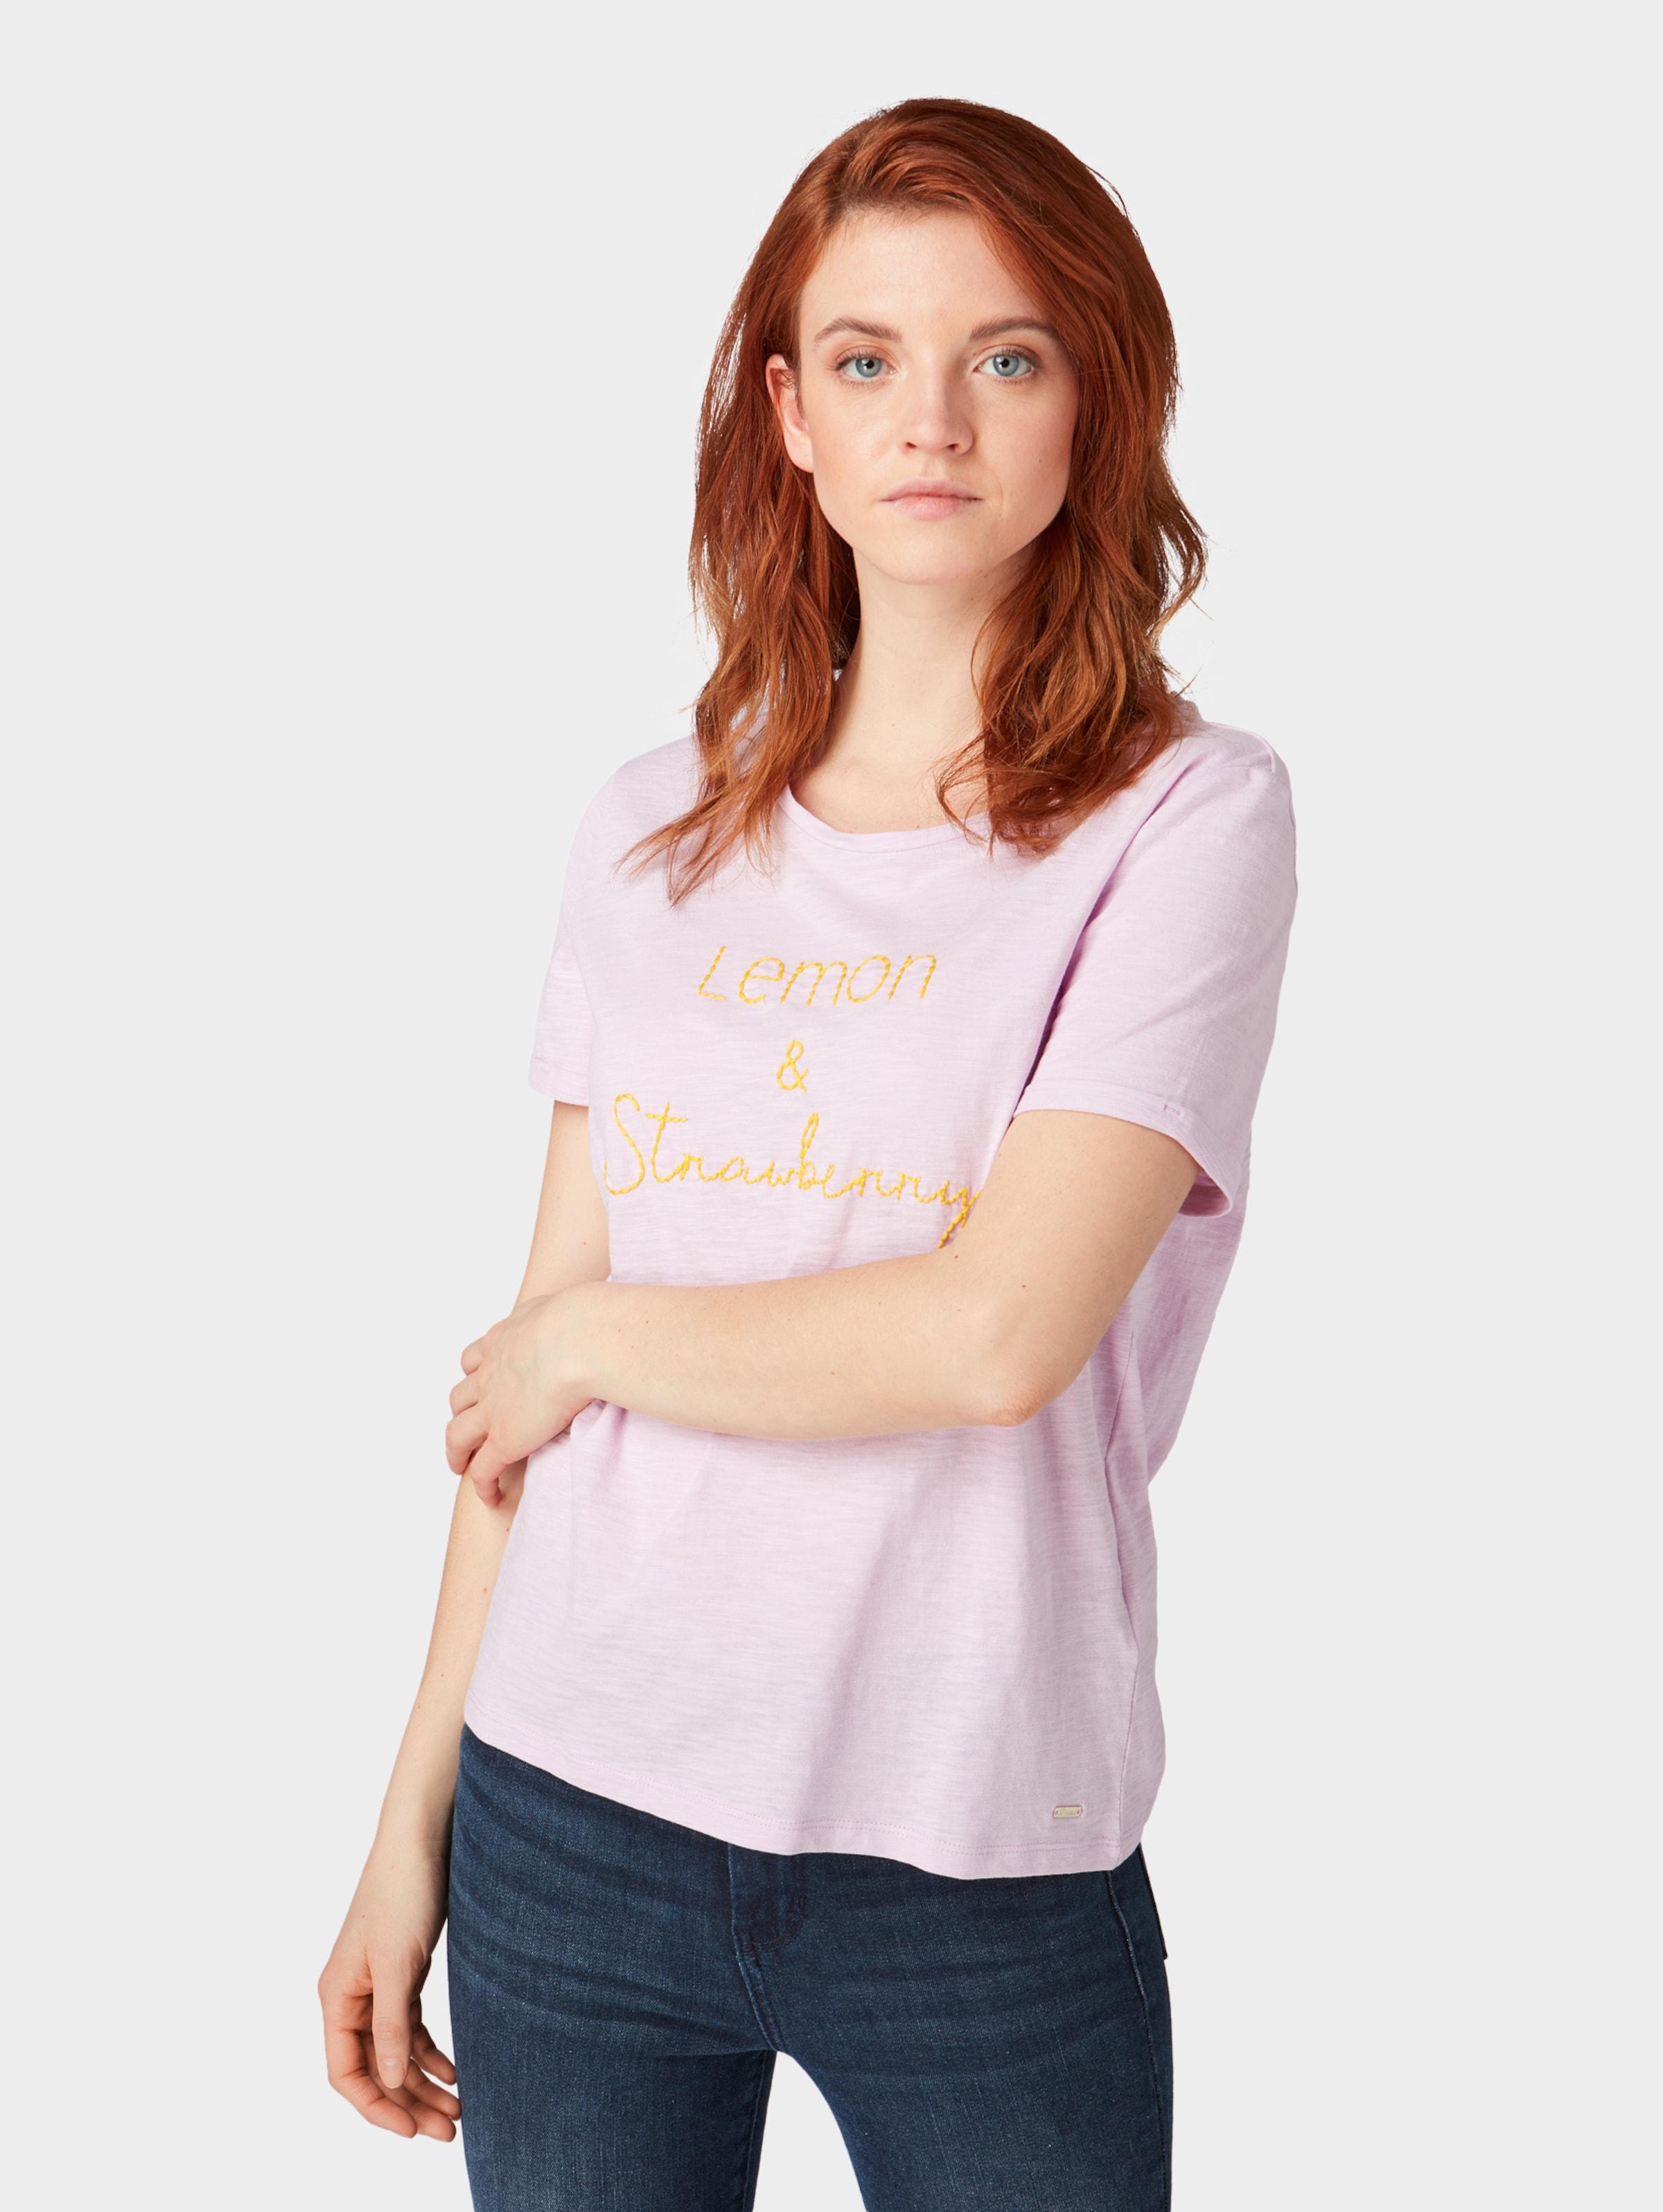 T shirt In GelbRosa Denim Tom Tailor N0w8nvm